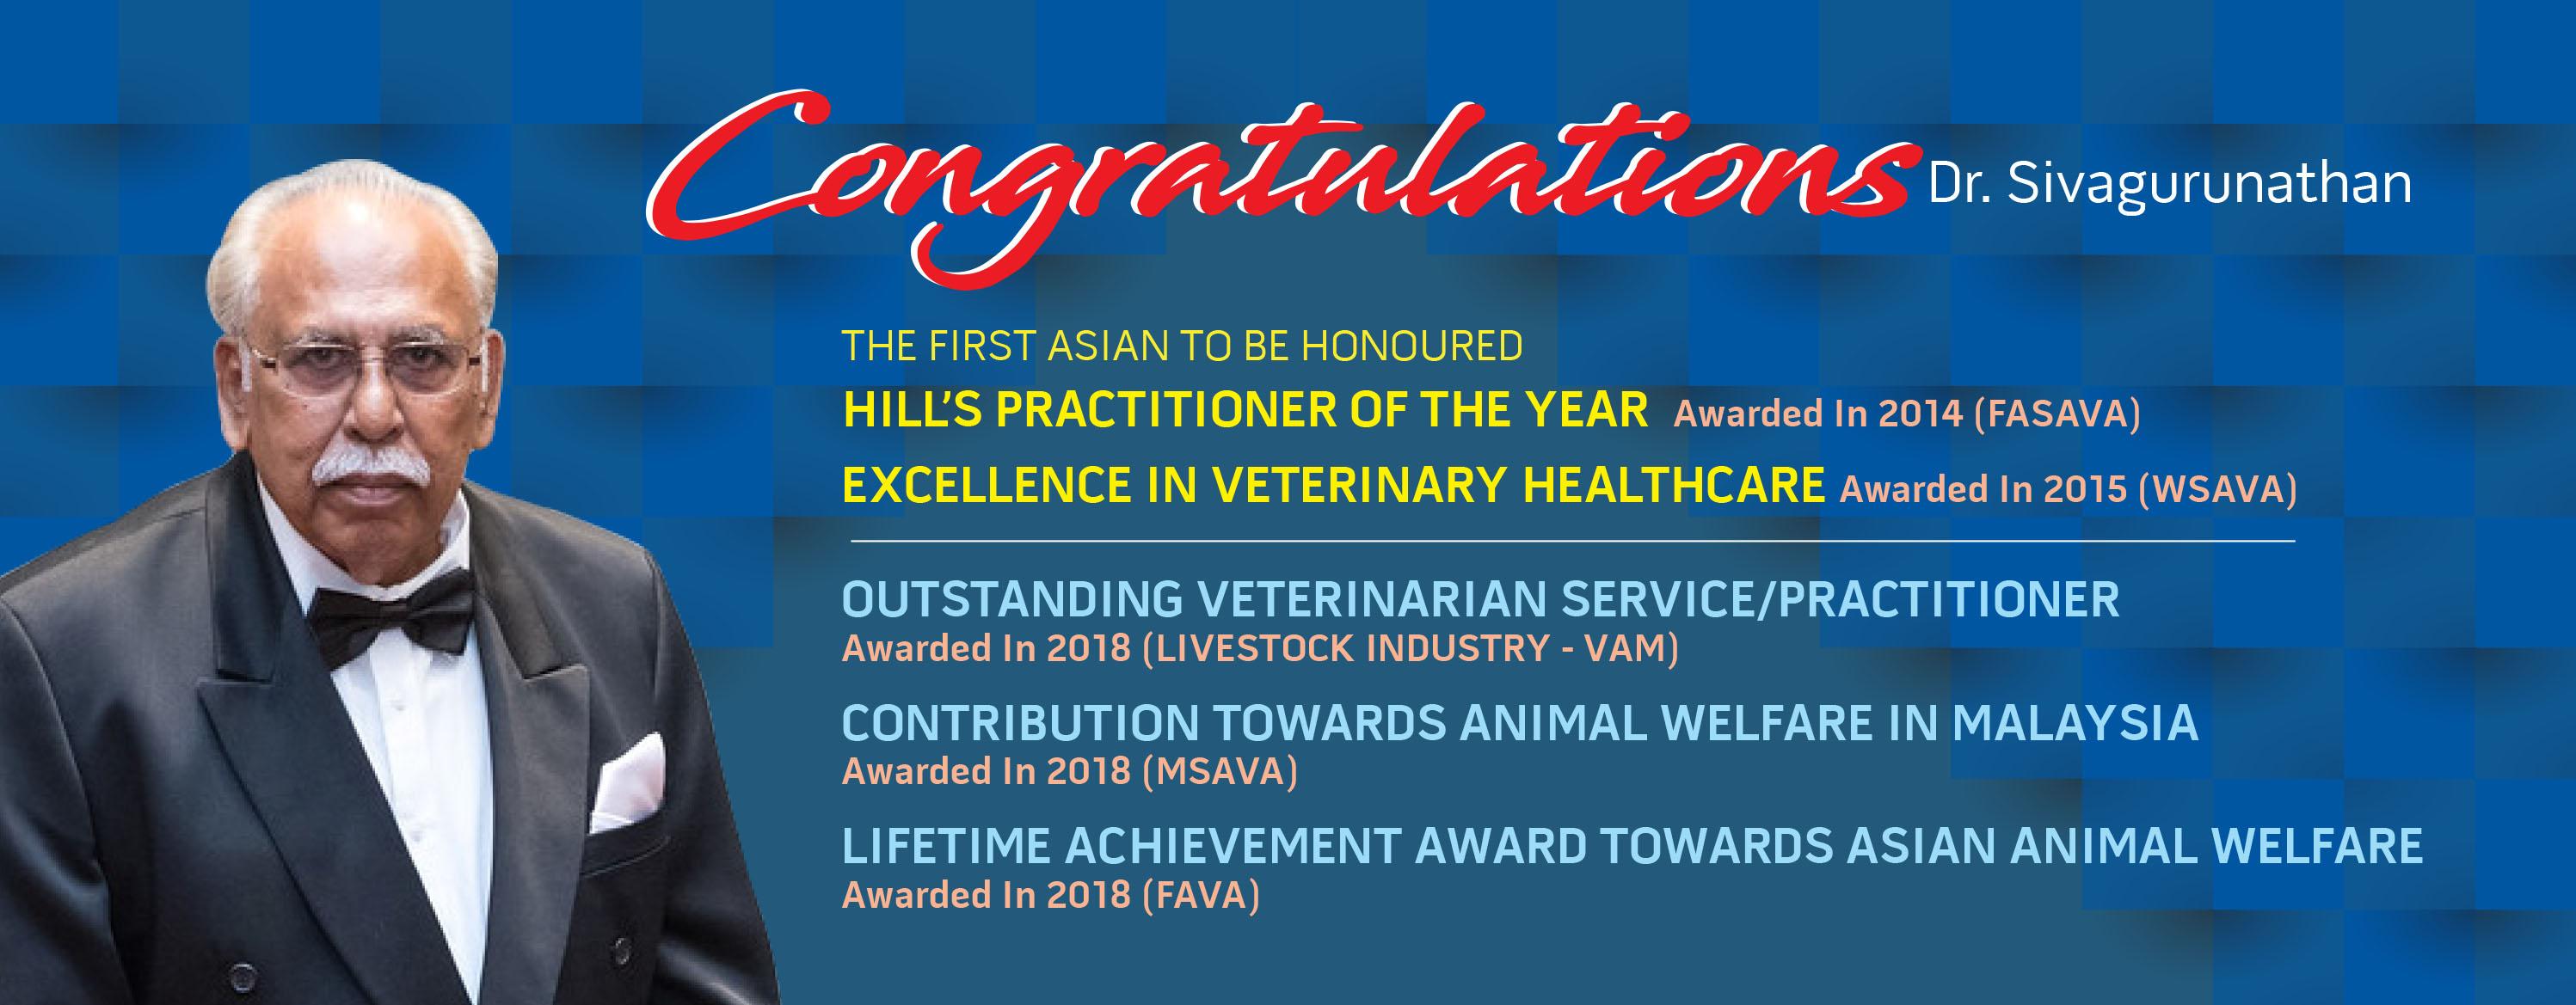 congratulation-dr-siva-pets-corner